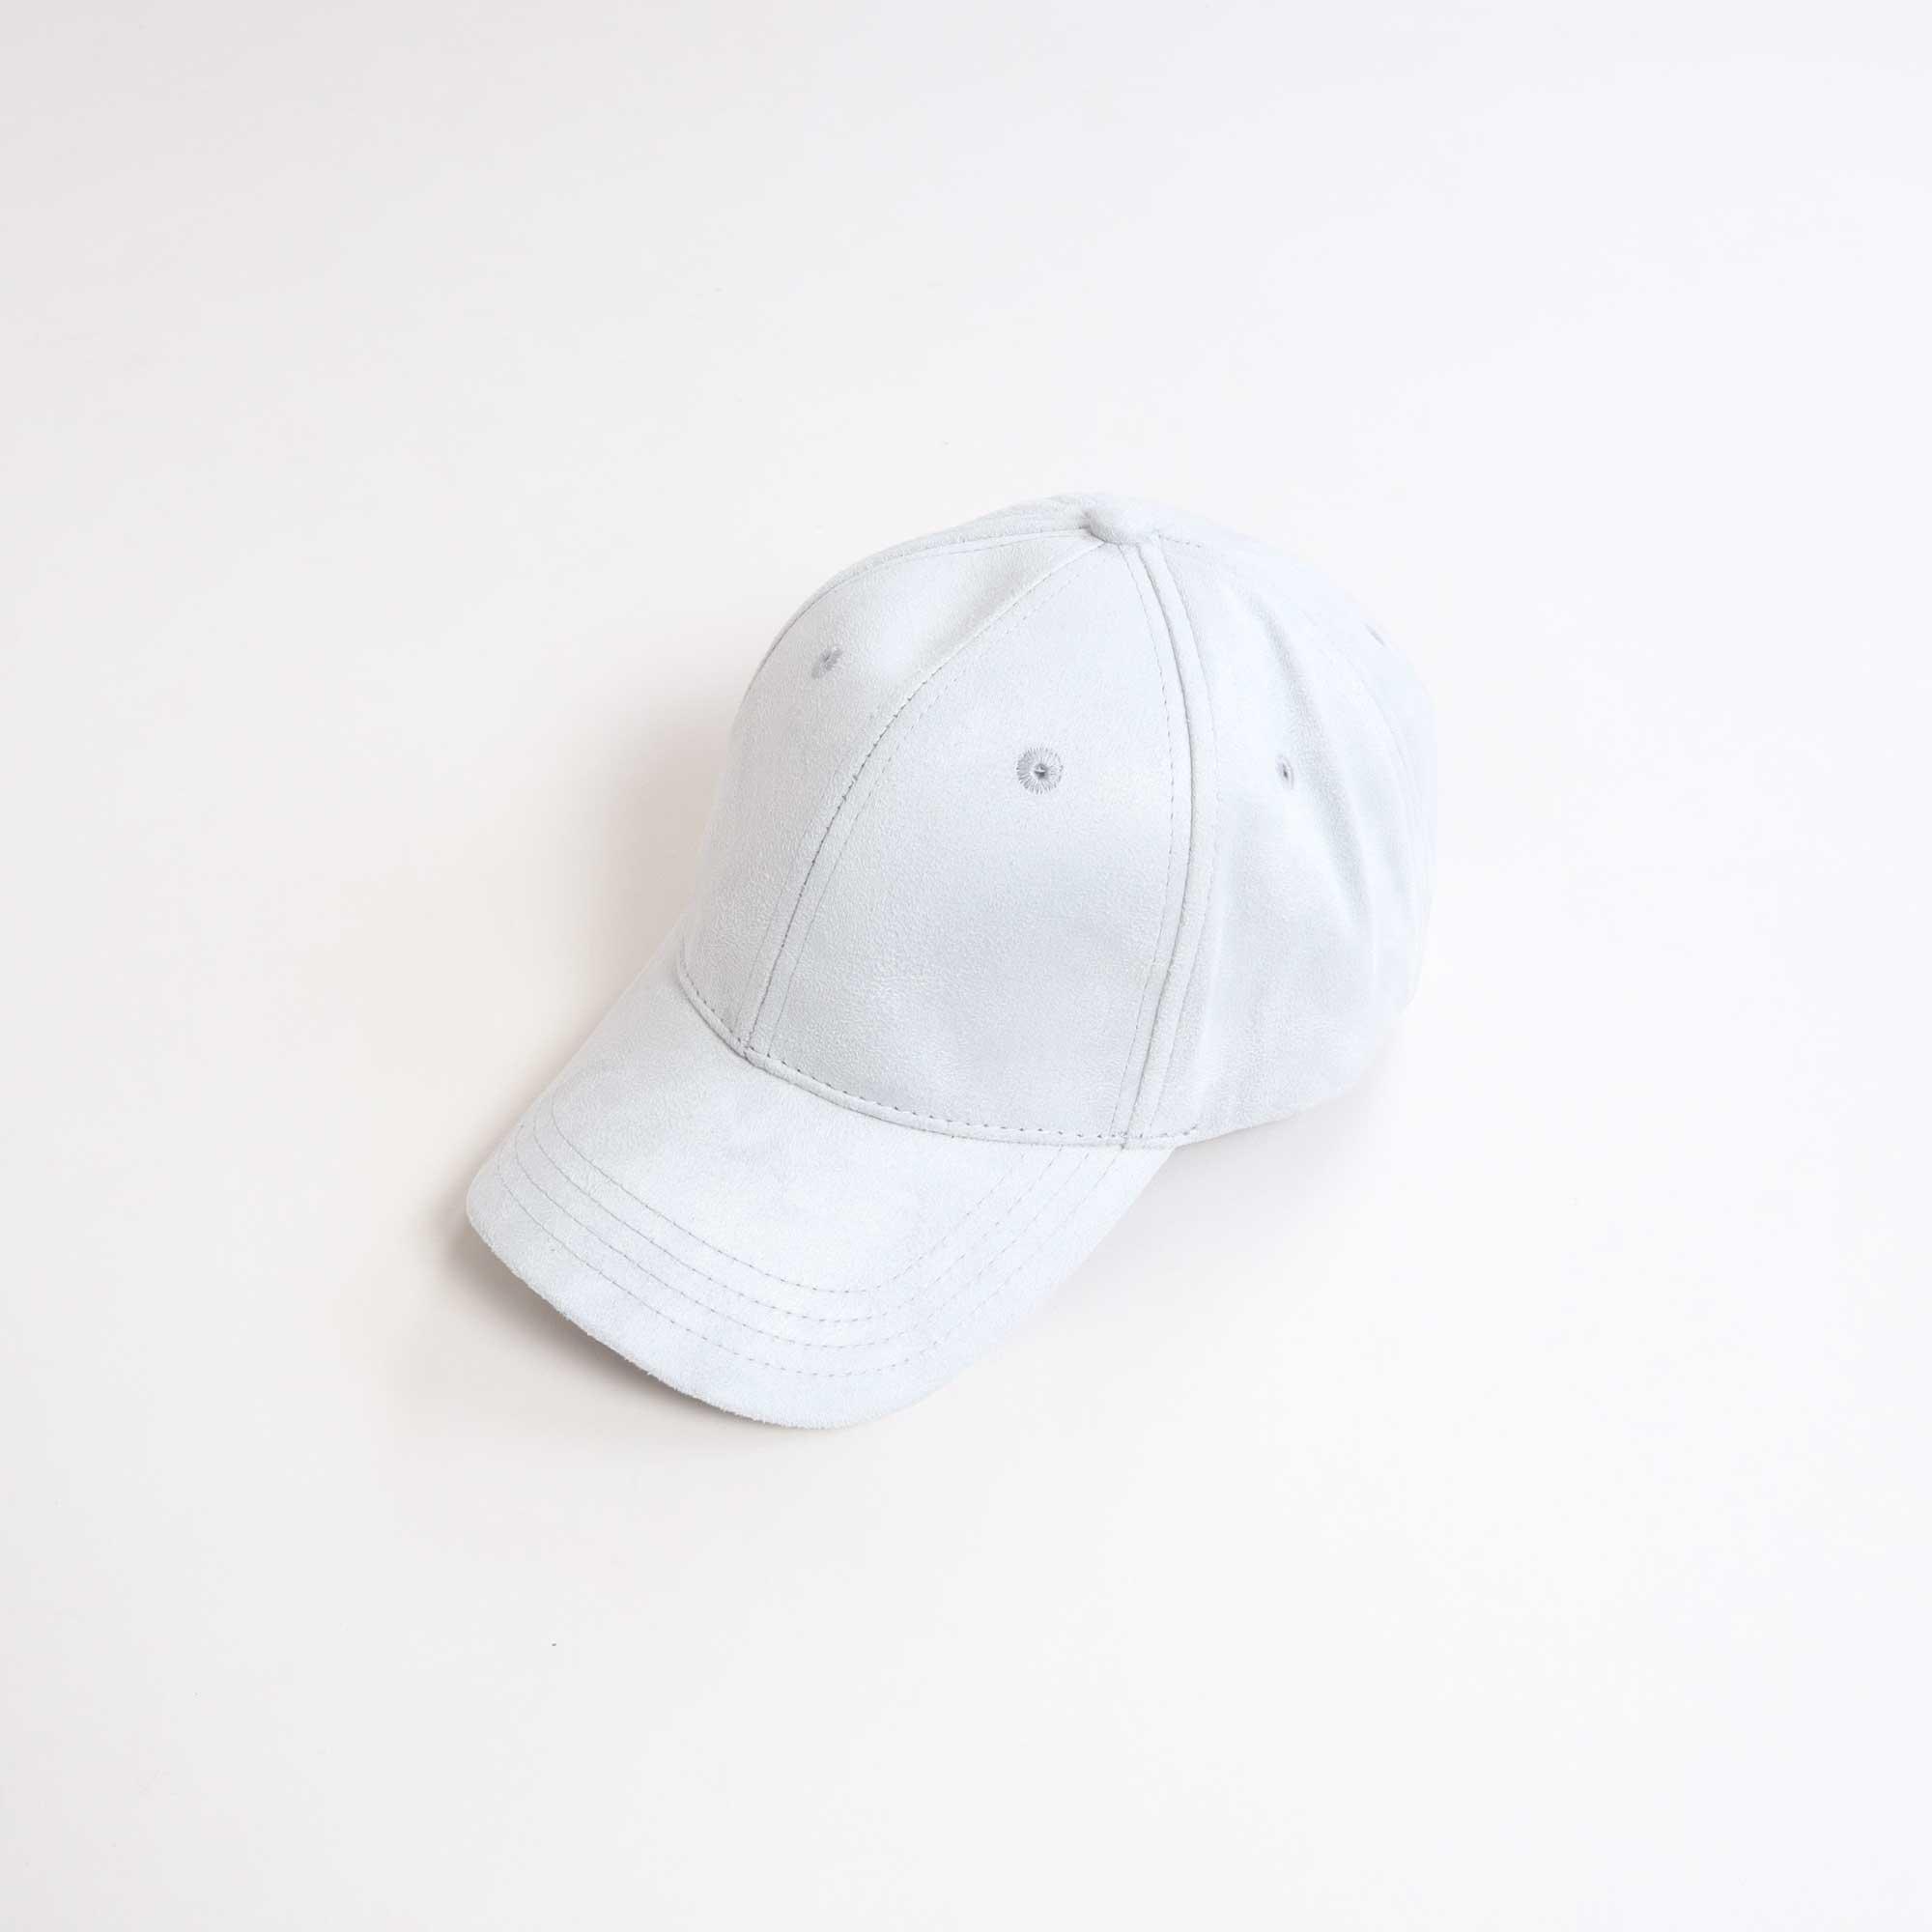 cap-silver-5